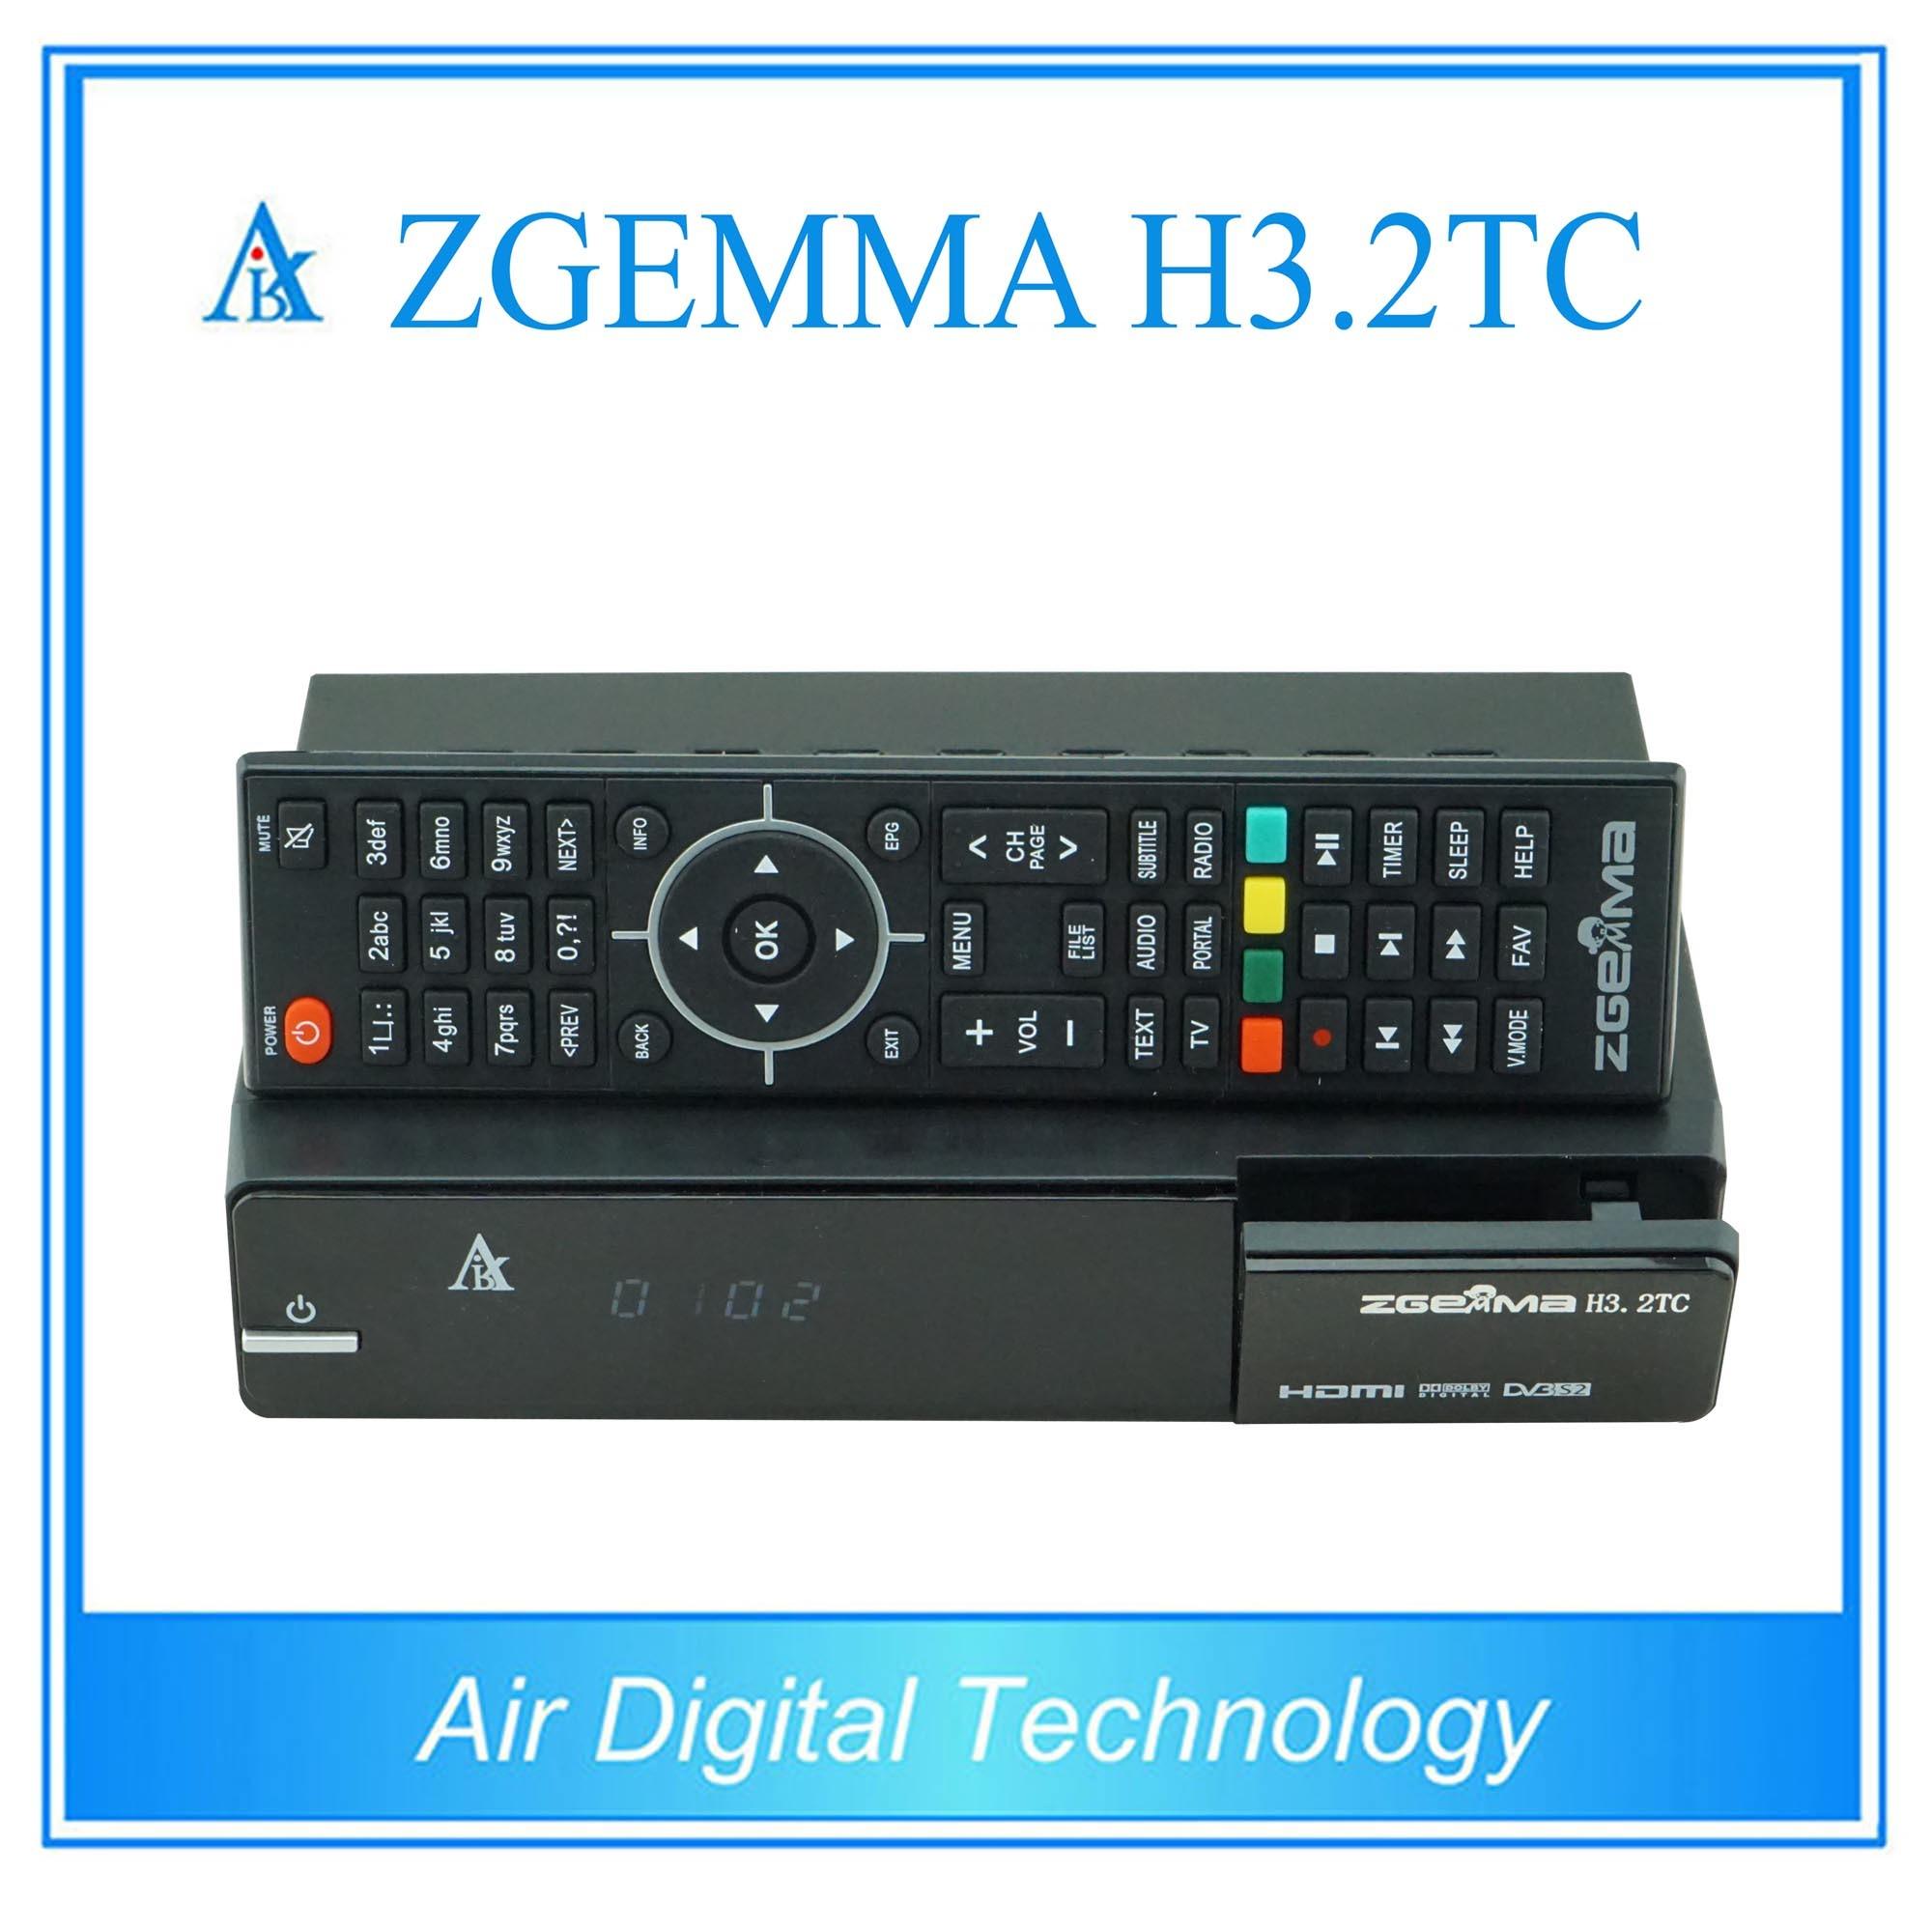 Zgemma H3.2tc Newest Satellite TV Box DVB S2 + 2 * DVB T2/C